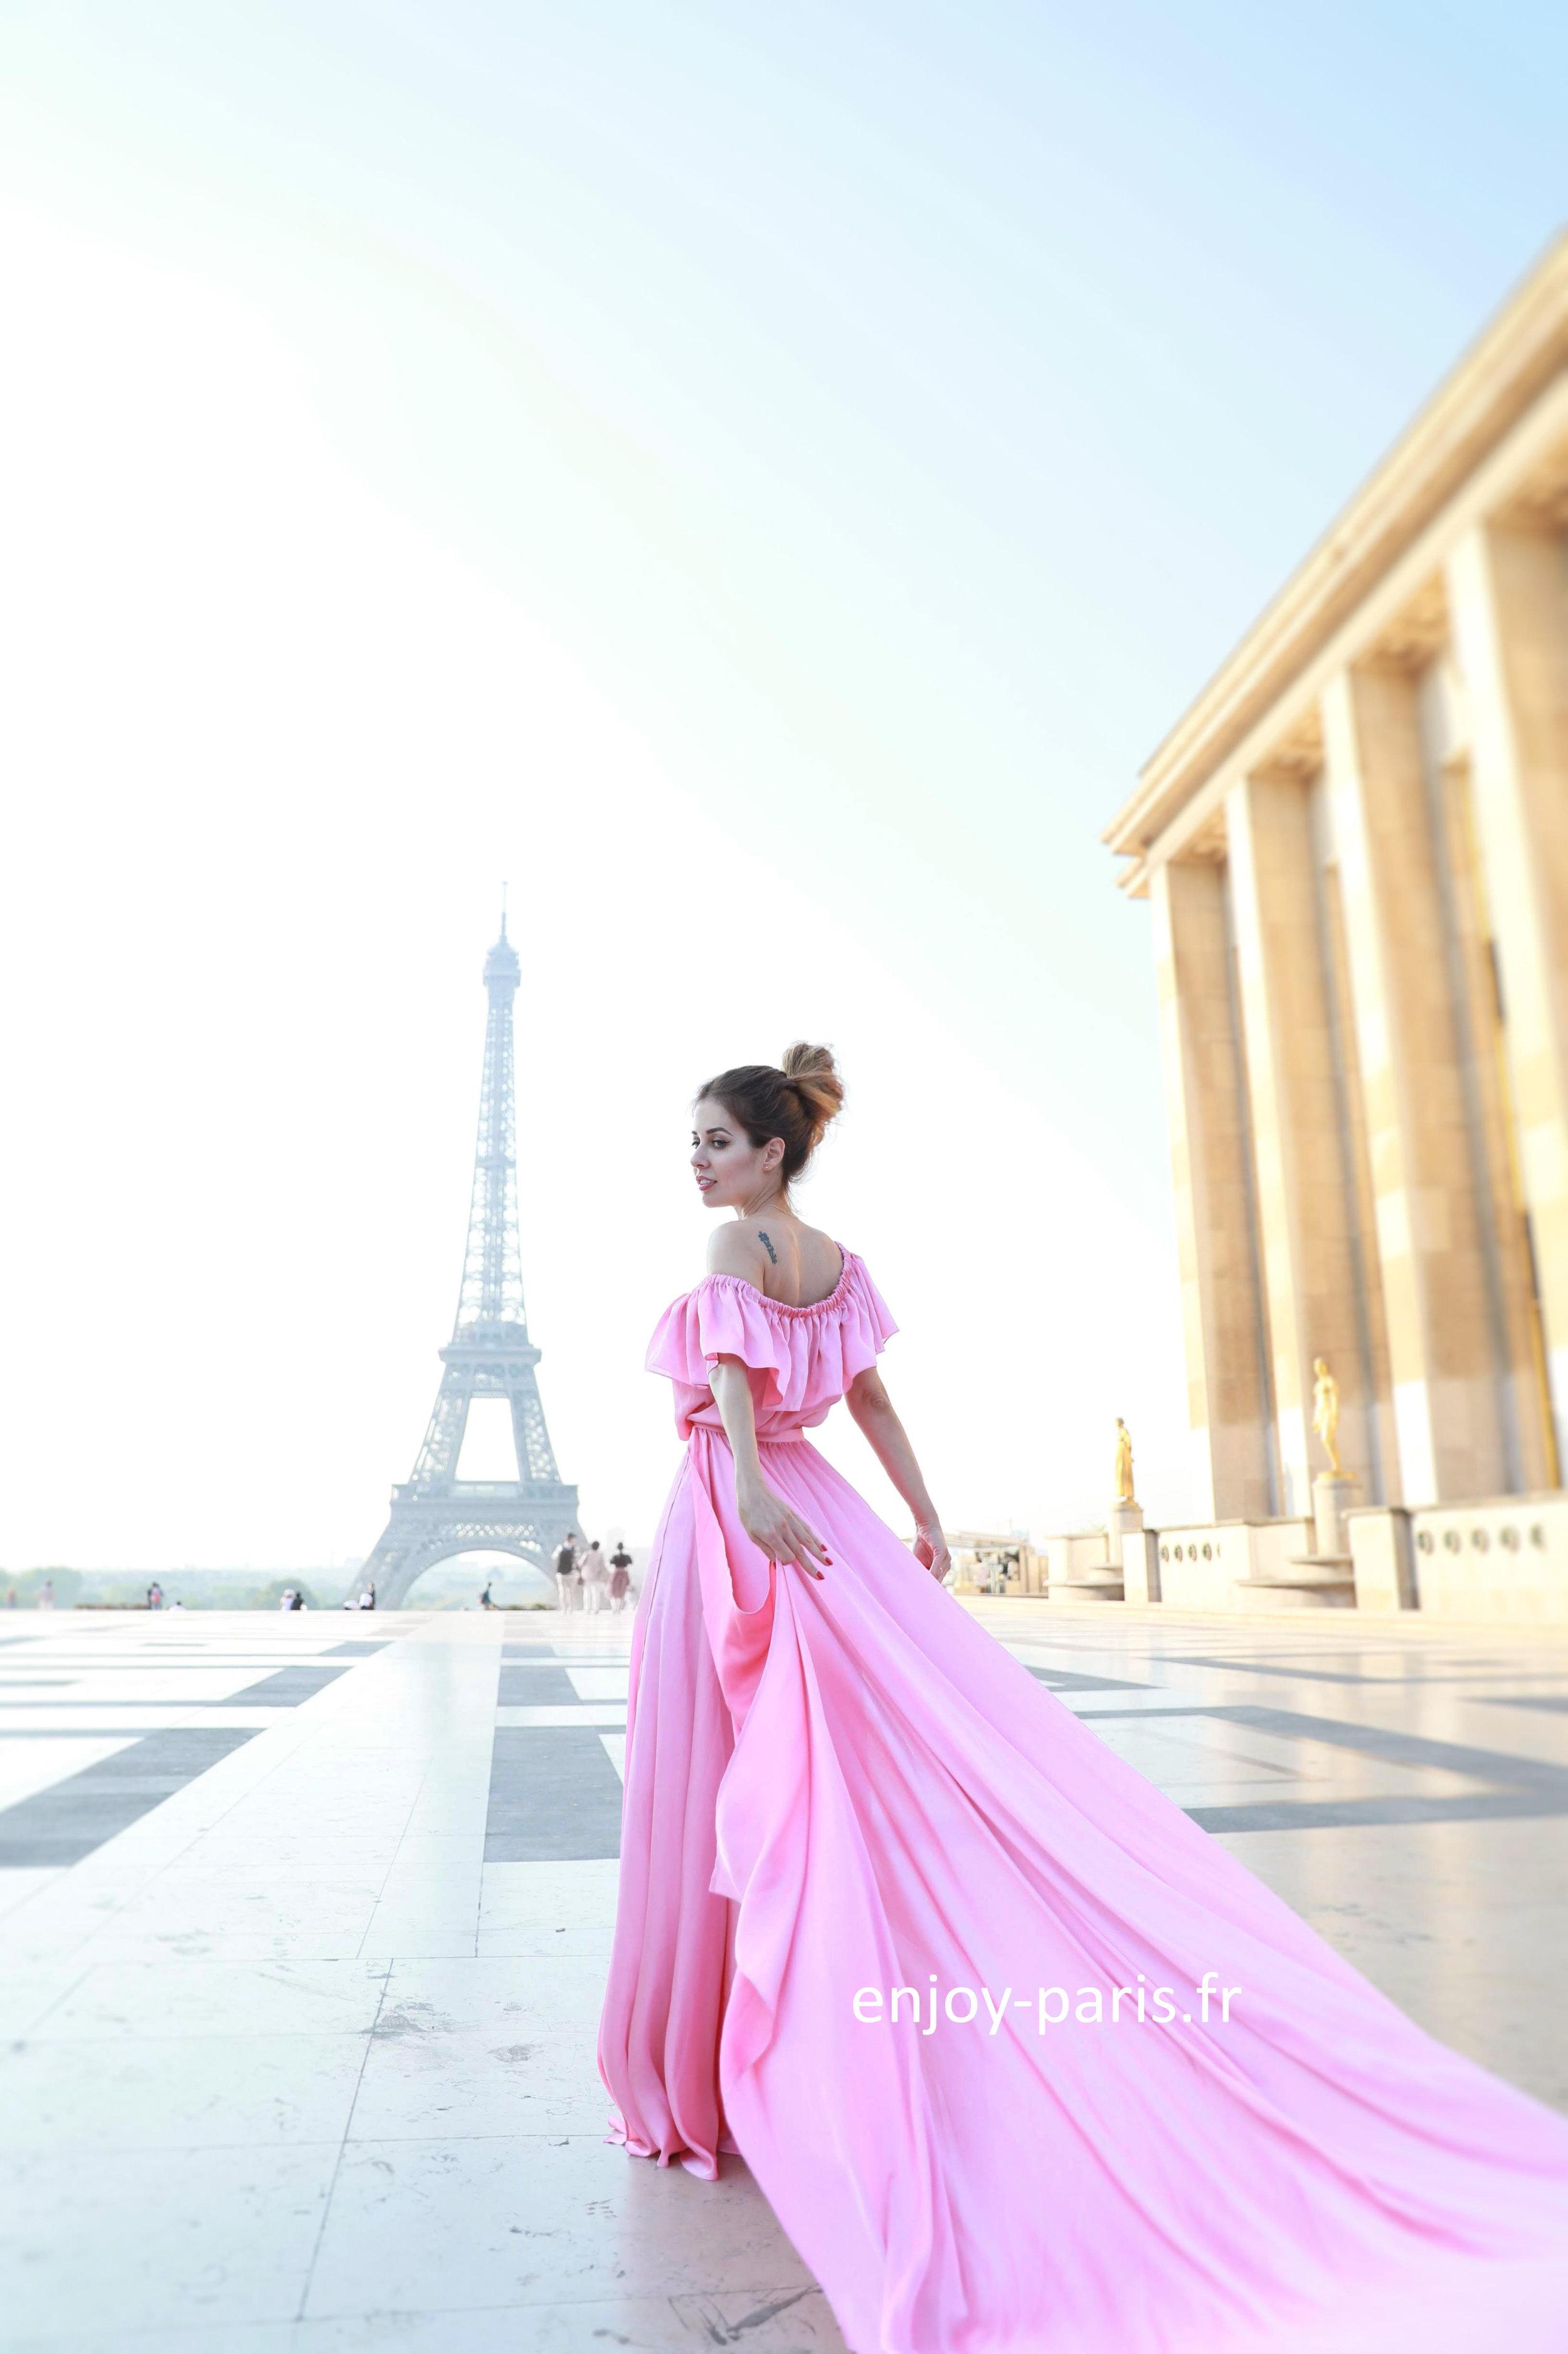 3_pink_dress.jpg